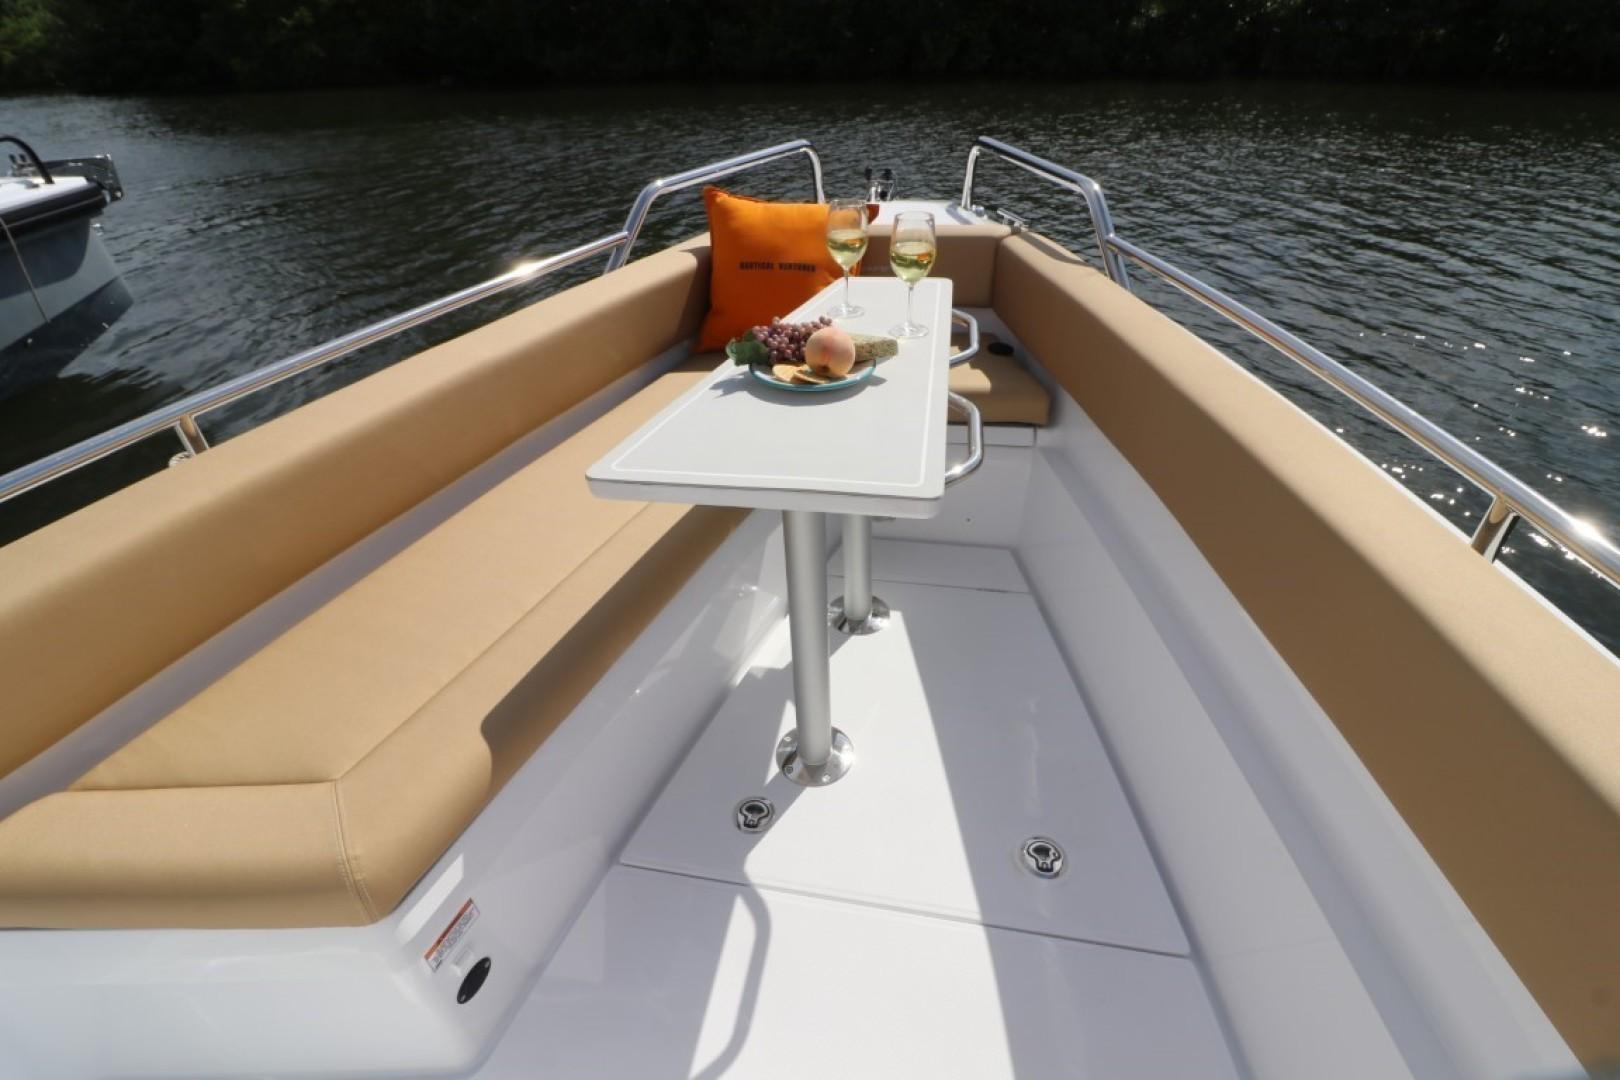 Axopar-28 CABIN 2020-Axopar 28 CABIN Fort Lauderdale-Florida-United States-1586684 | Thumbnail